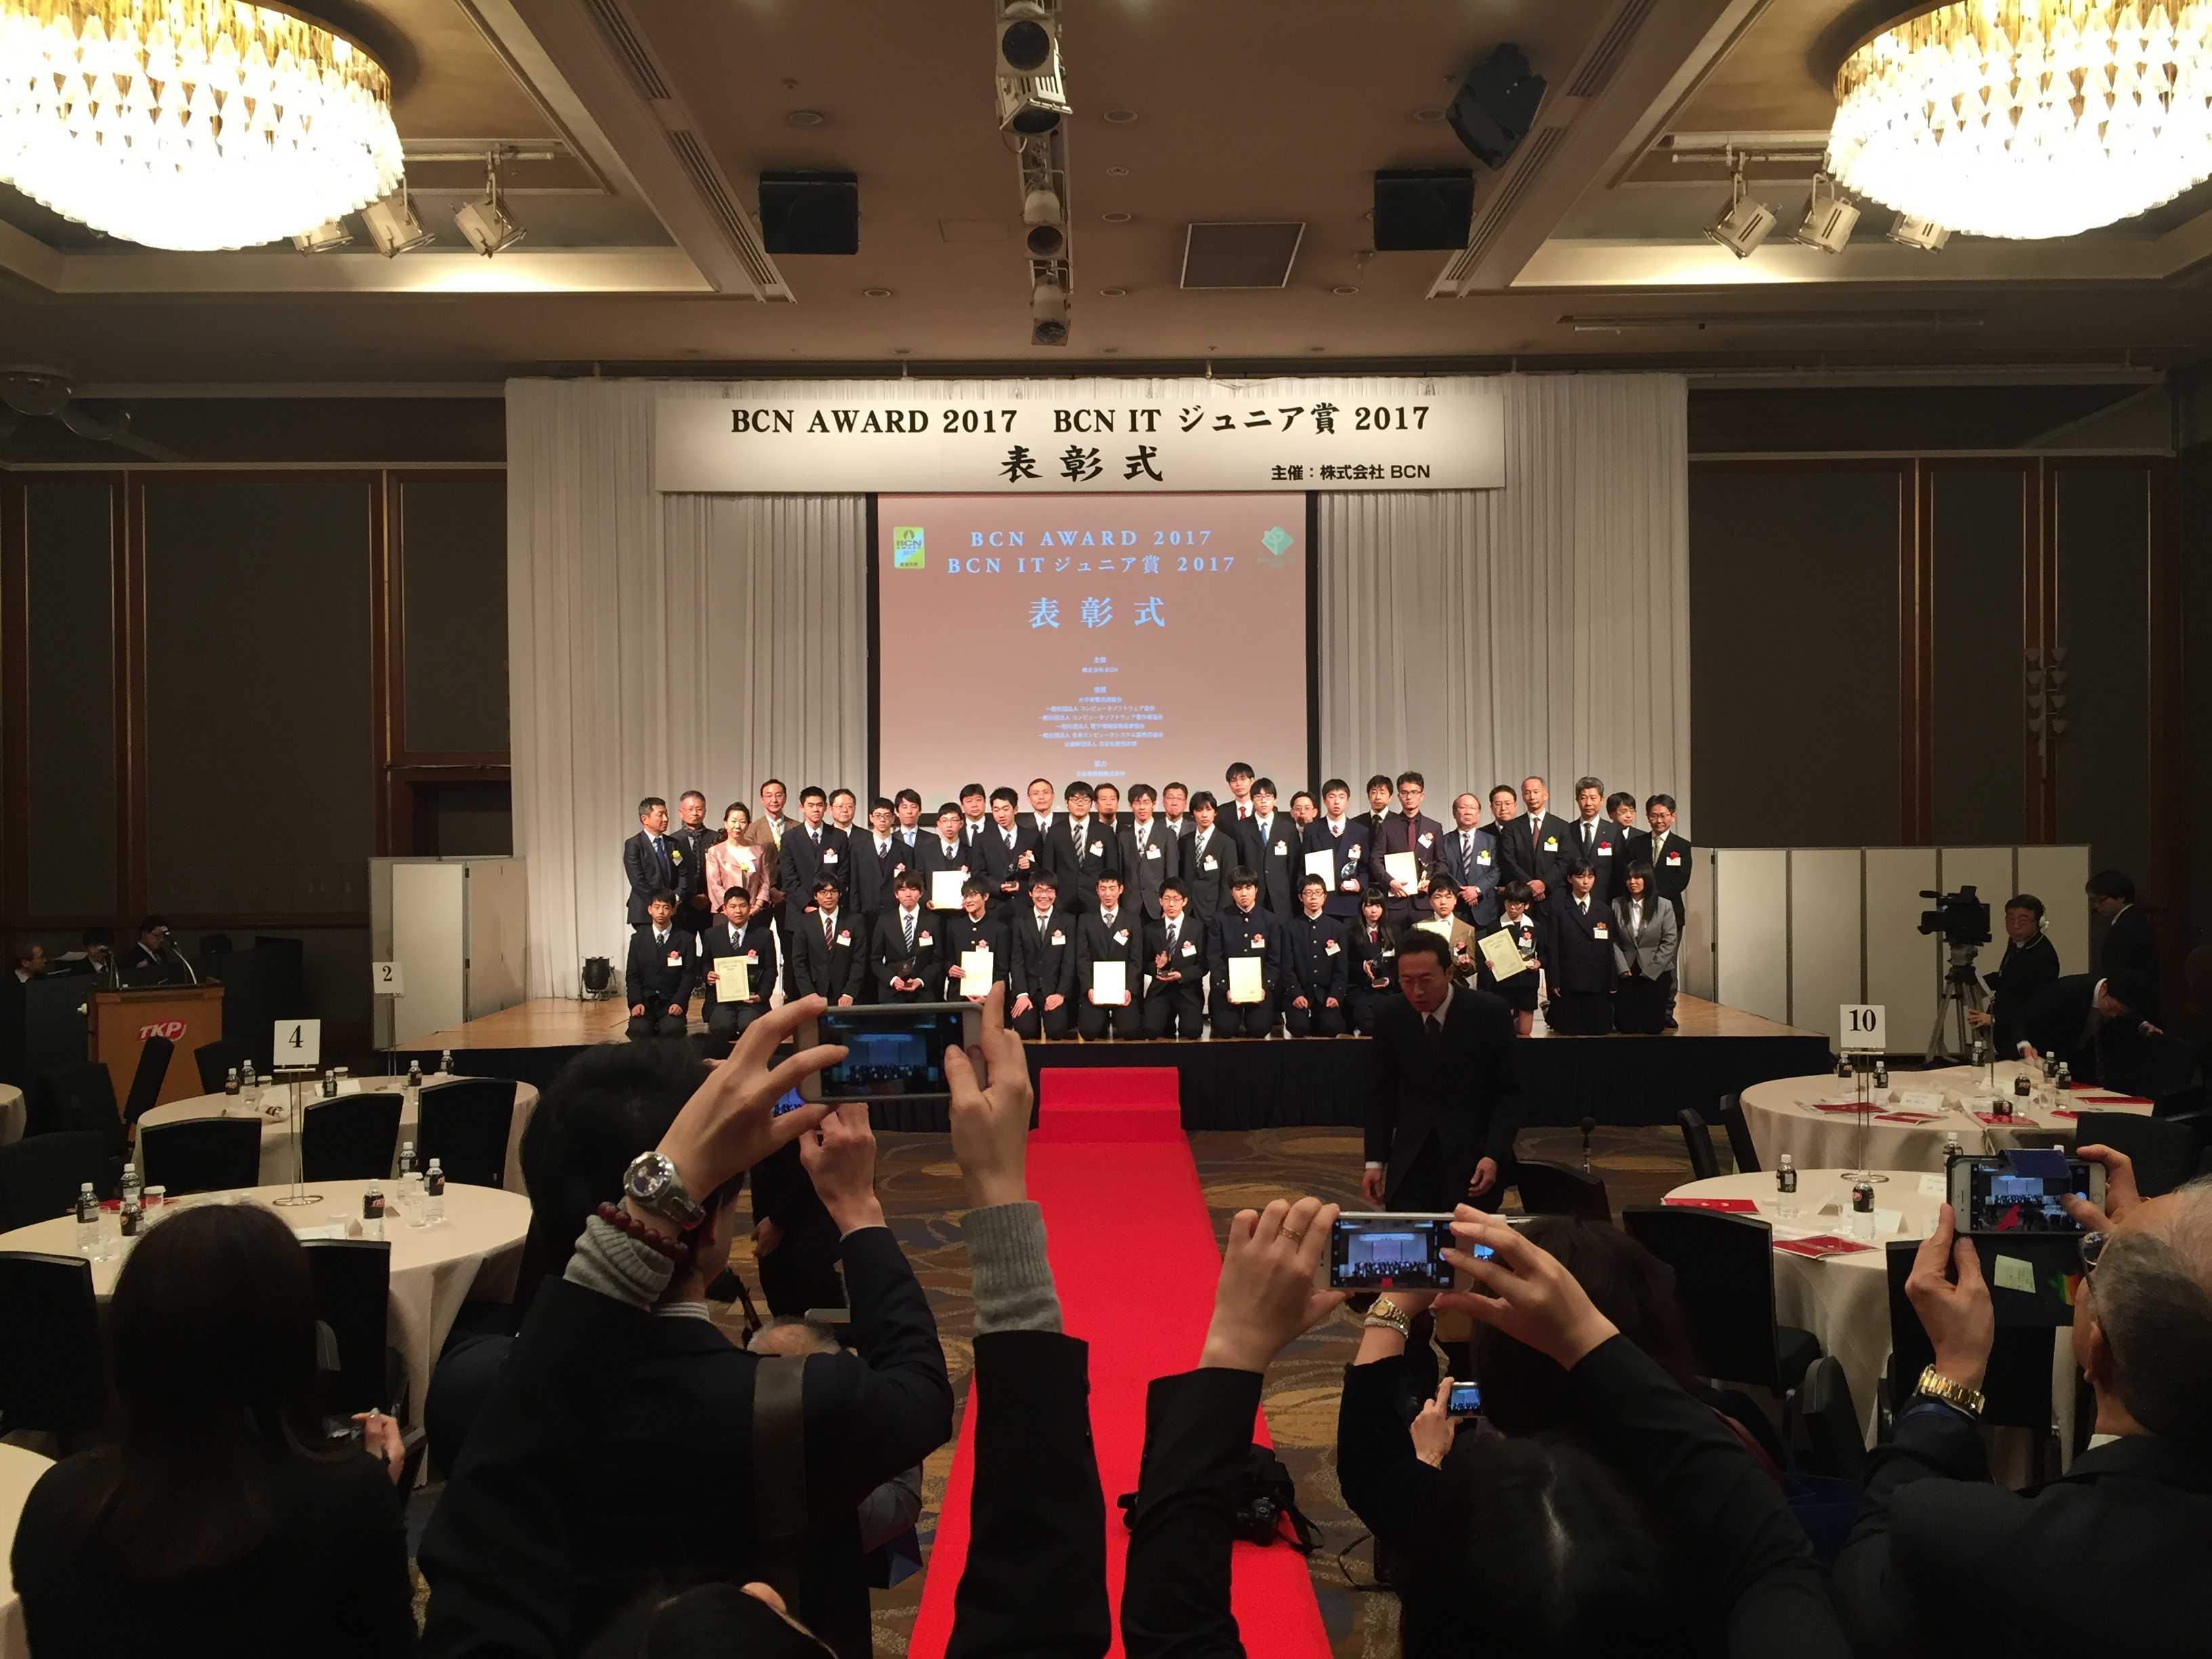 BCN ITジュニア賞